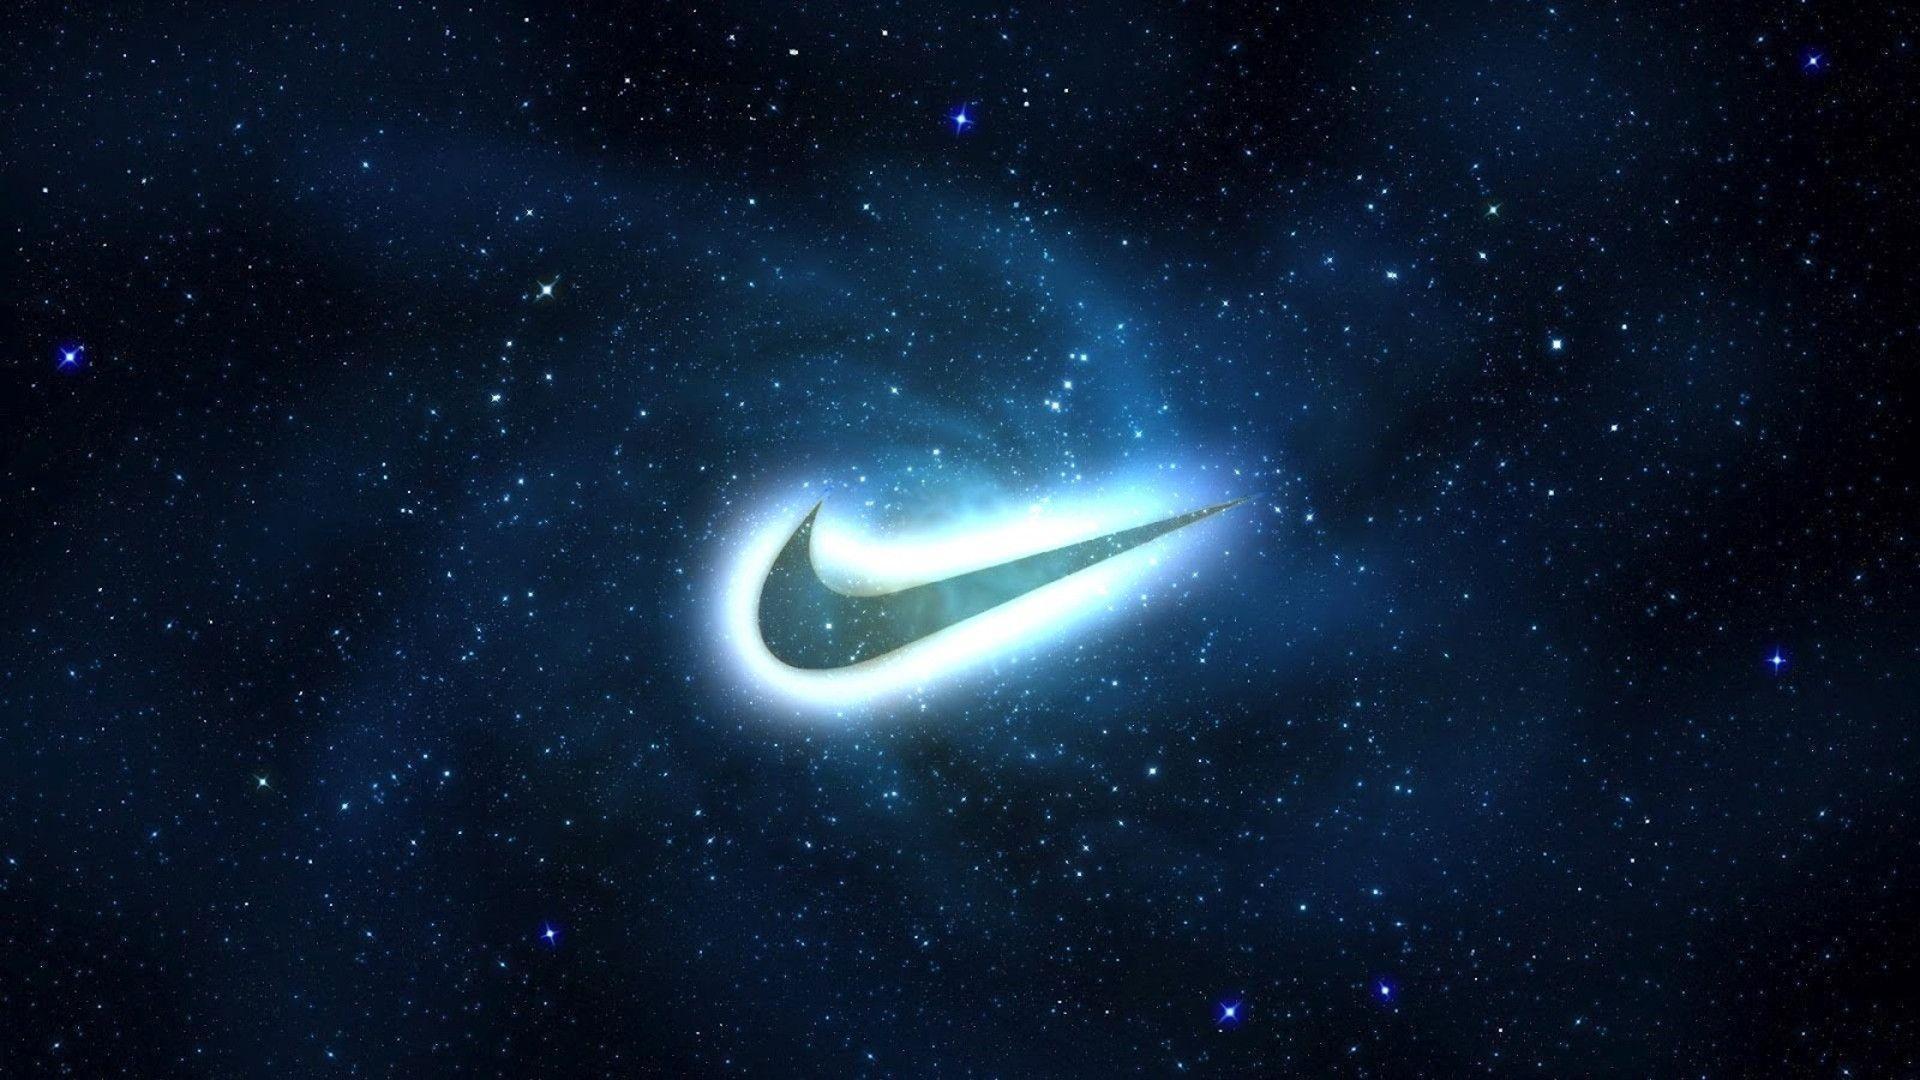 Galaxy Nike WallPaper HD - IMASHON.